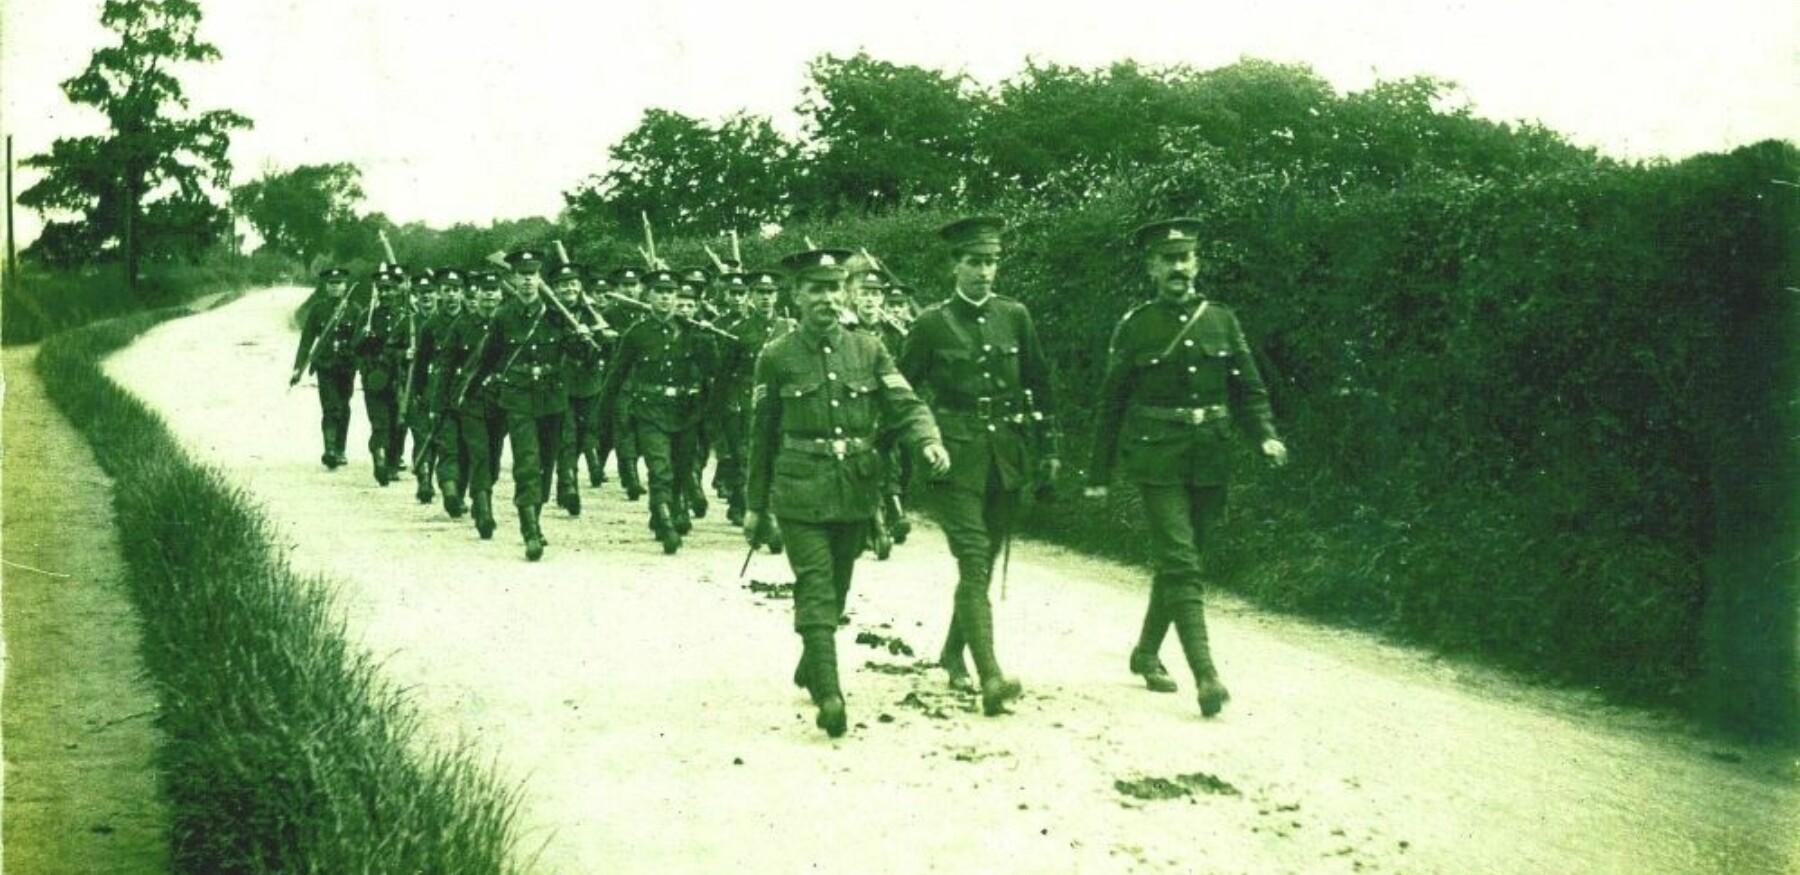 5th battalion on a training march 997 642 80